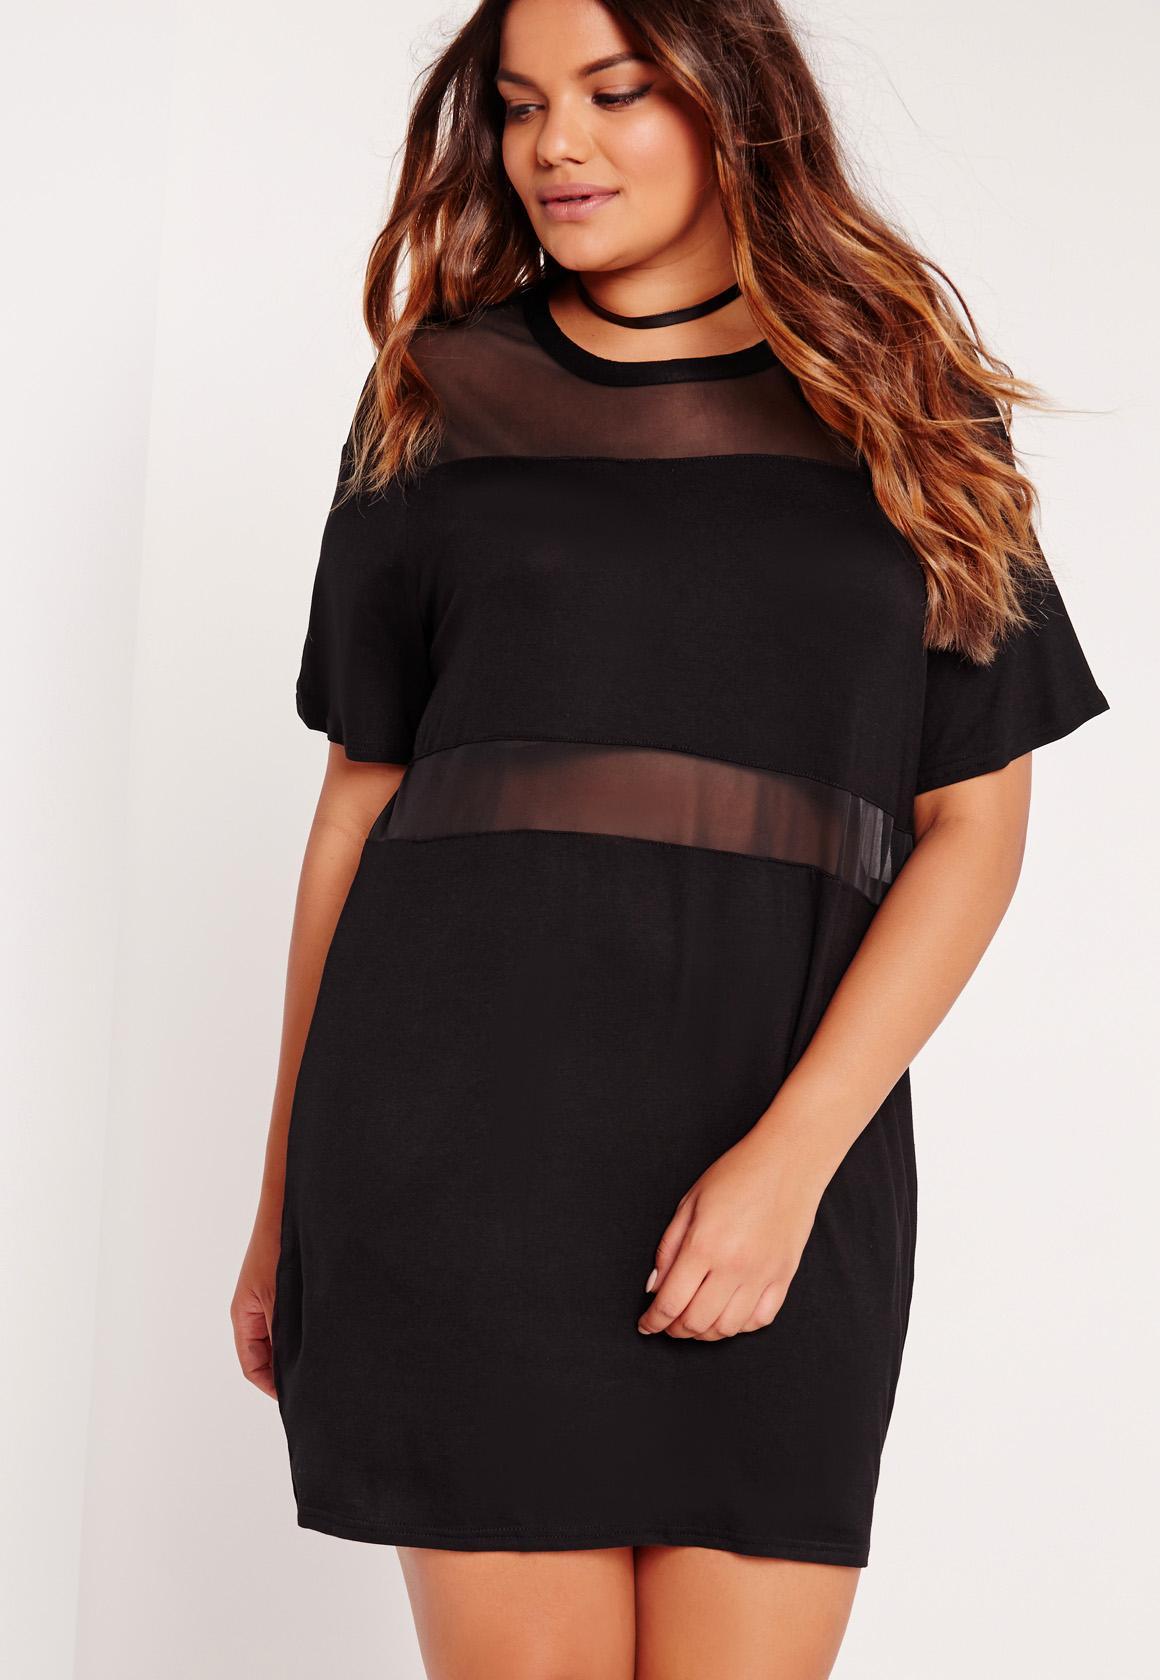 Plus Size Black Mesh Insert Oversized Dress | Missguided